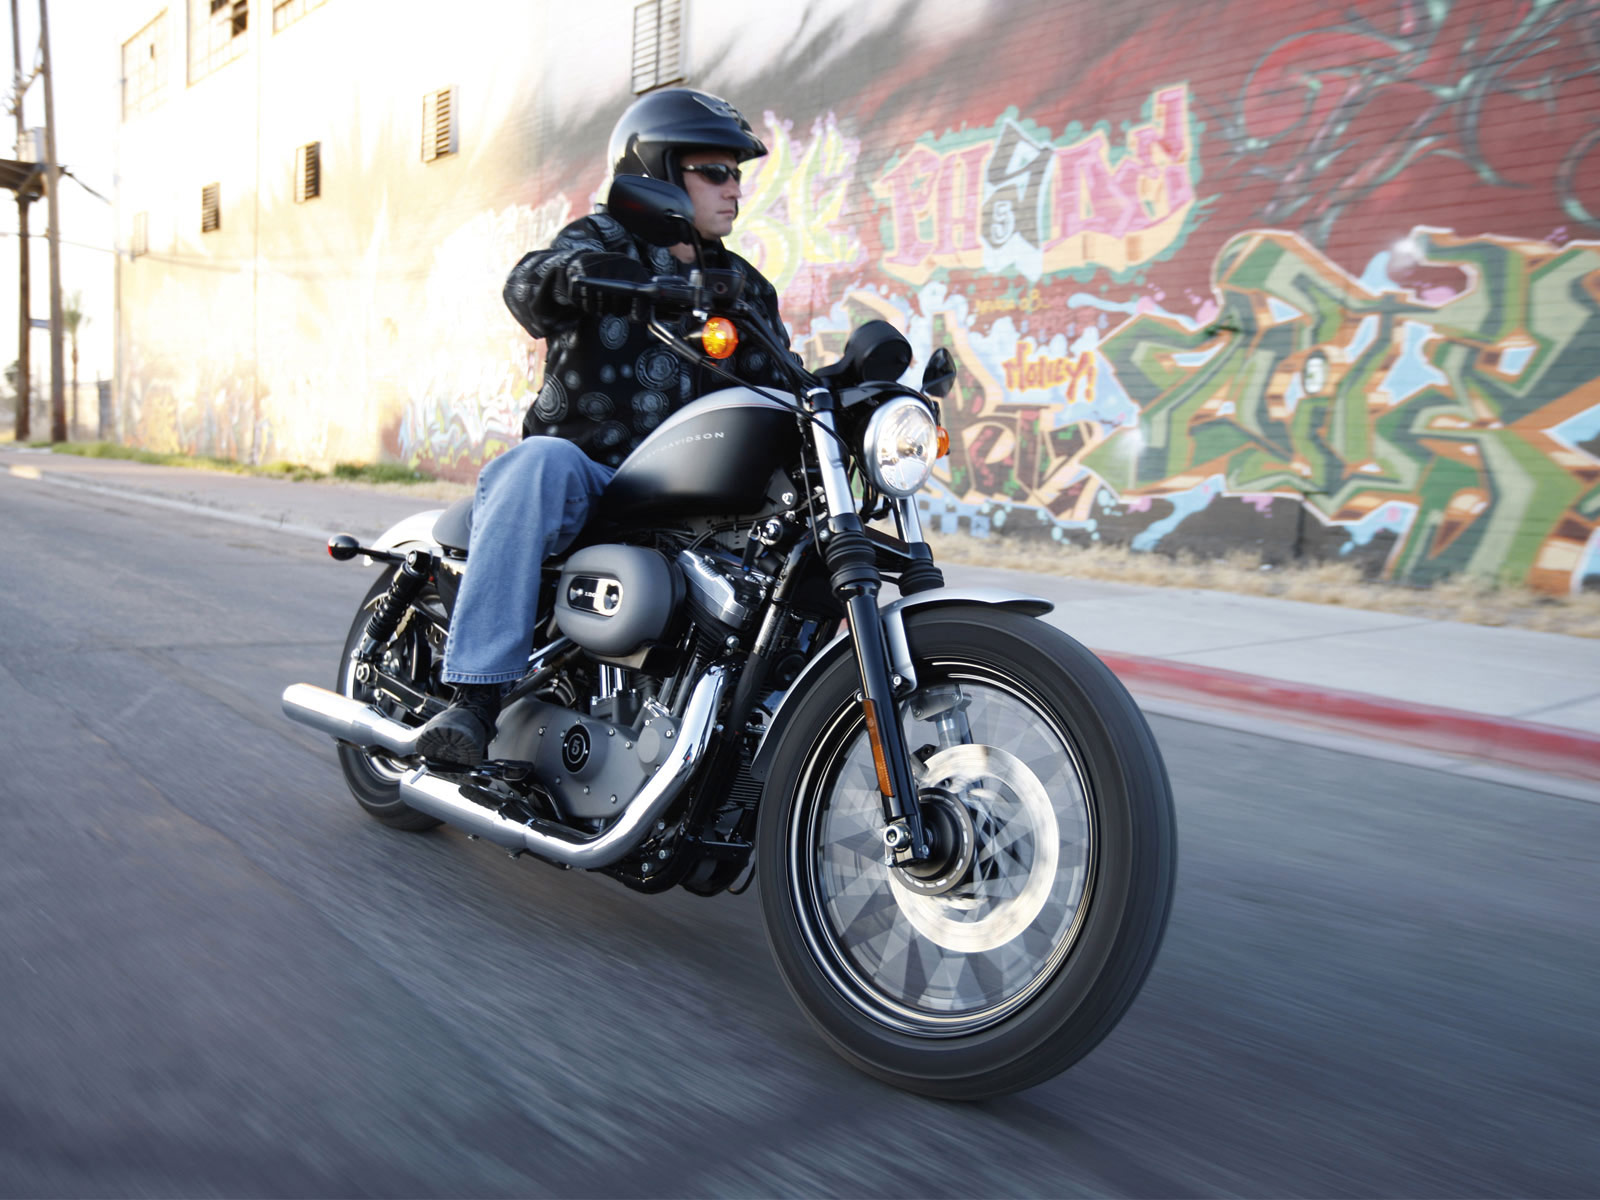 Harley Davidson: XL1200N Nightster (2010) Auto Insurance